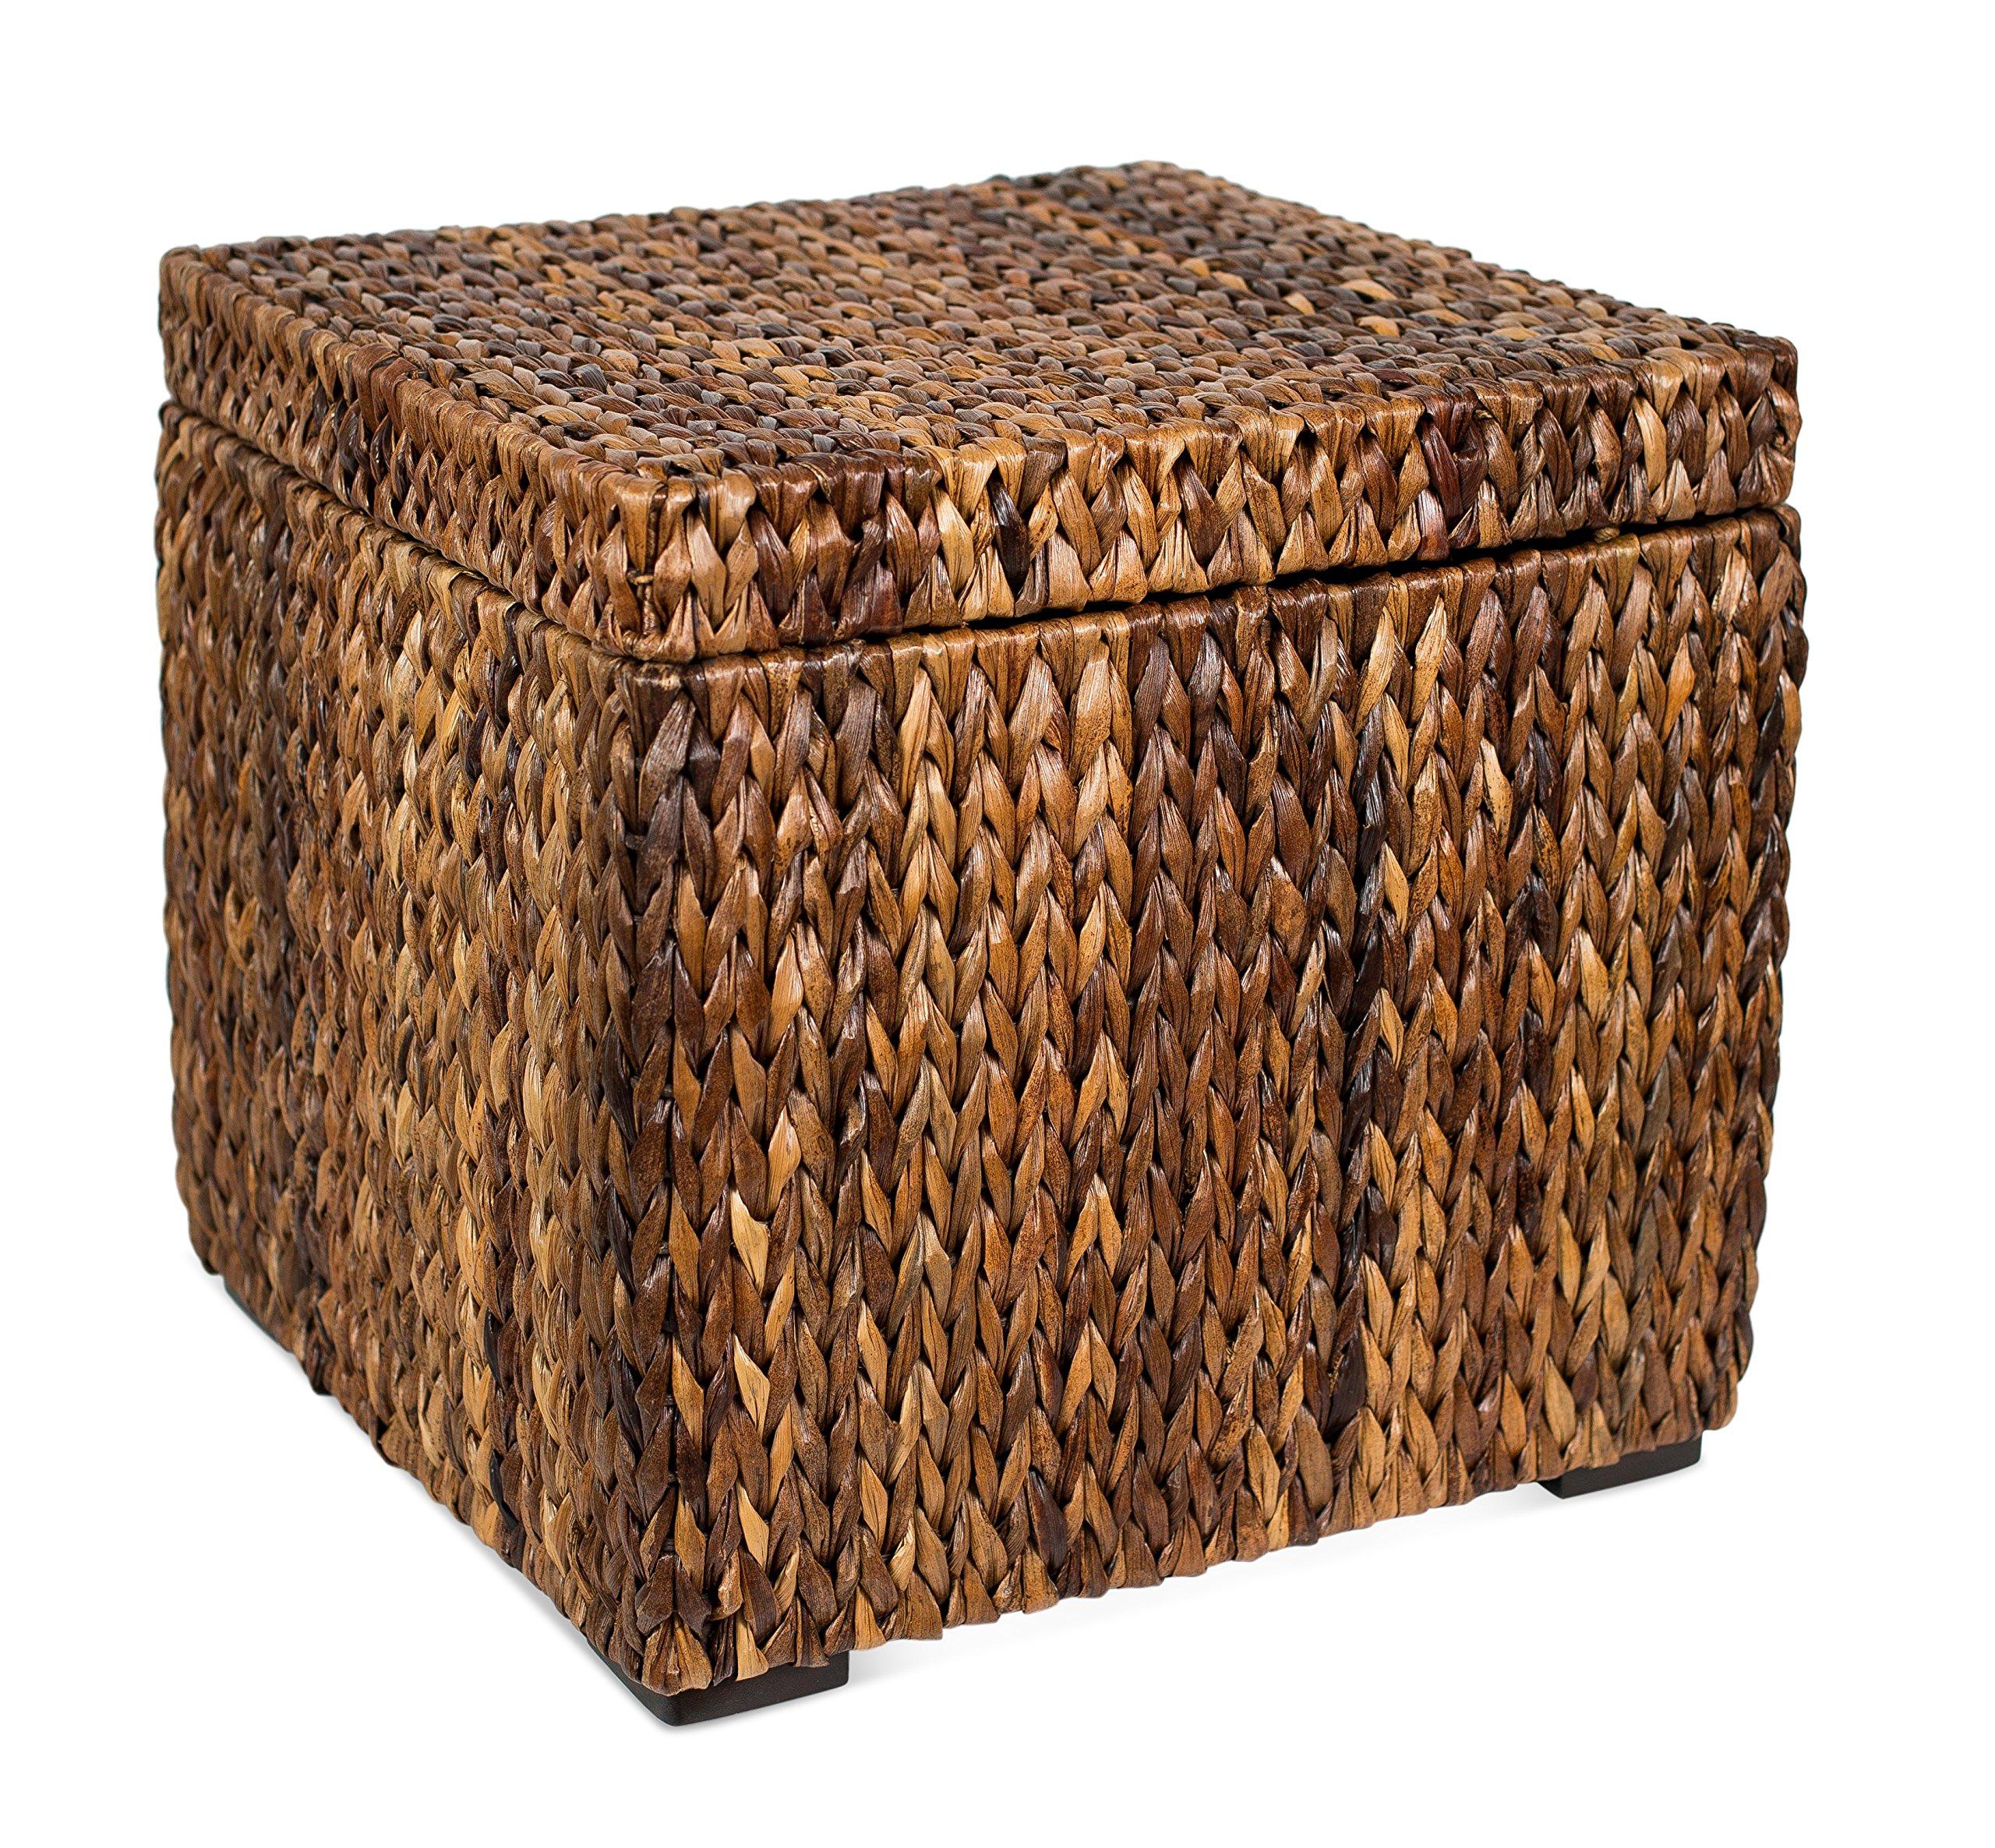 BirdRock Home Woven Storage Cube by BirdRock Home (Image #1)